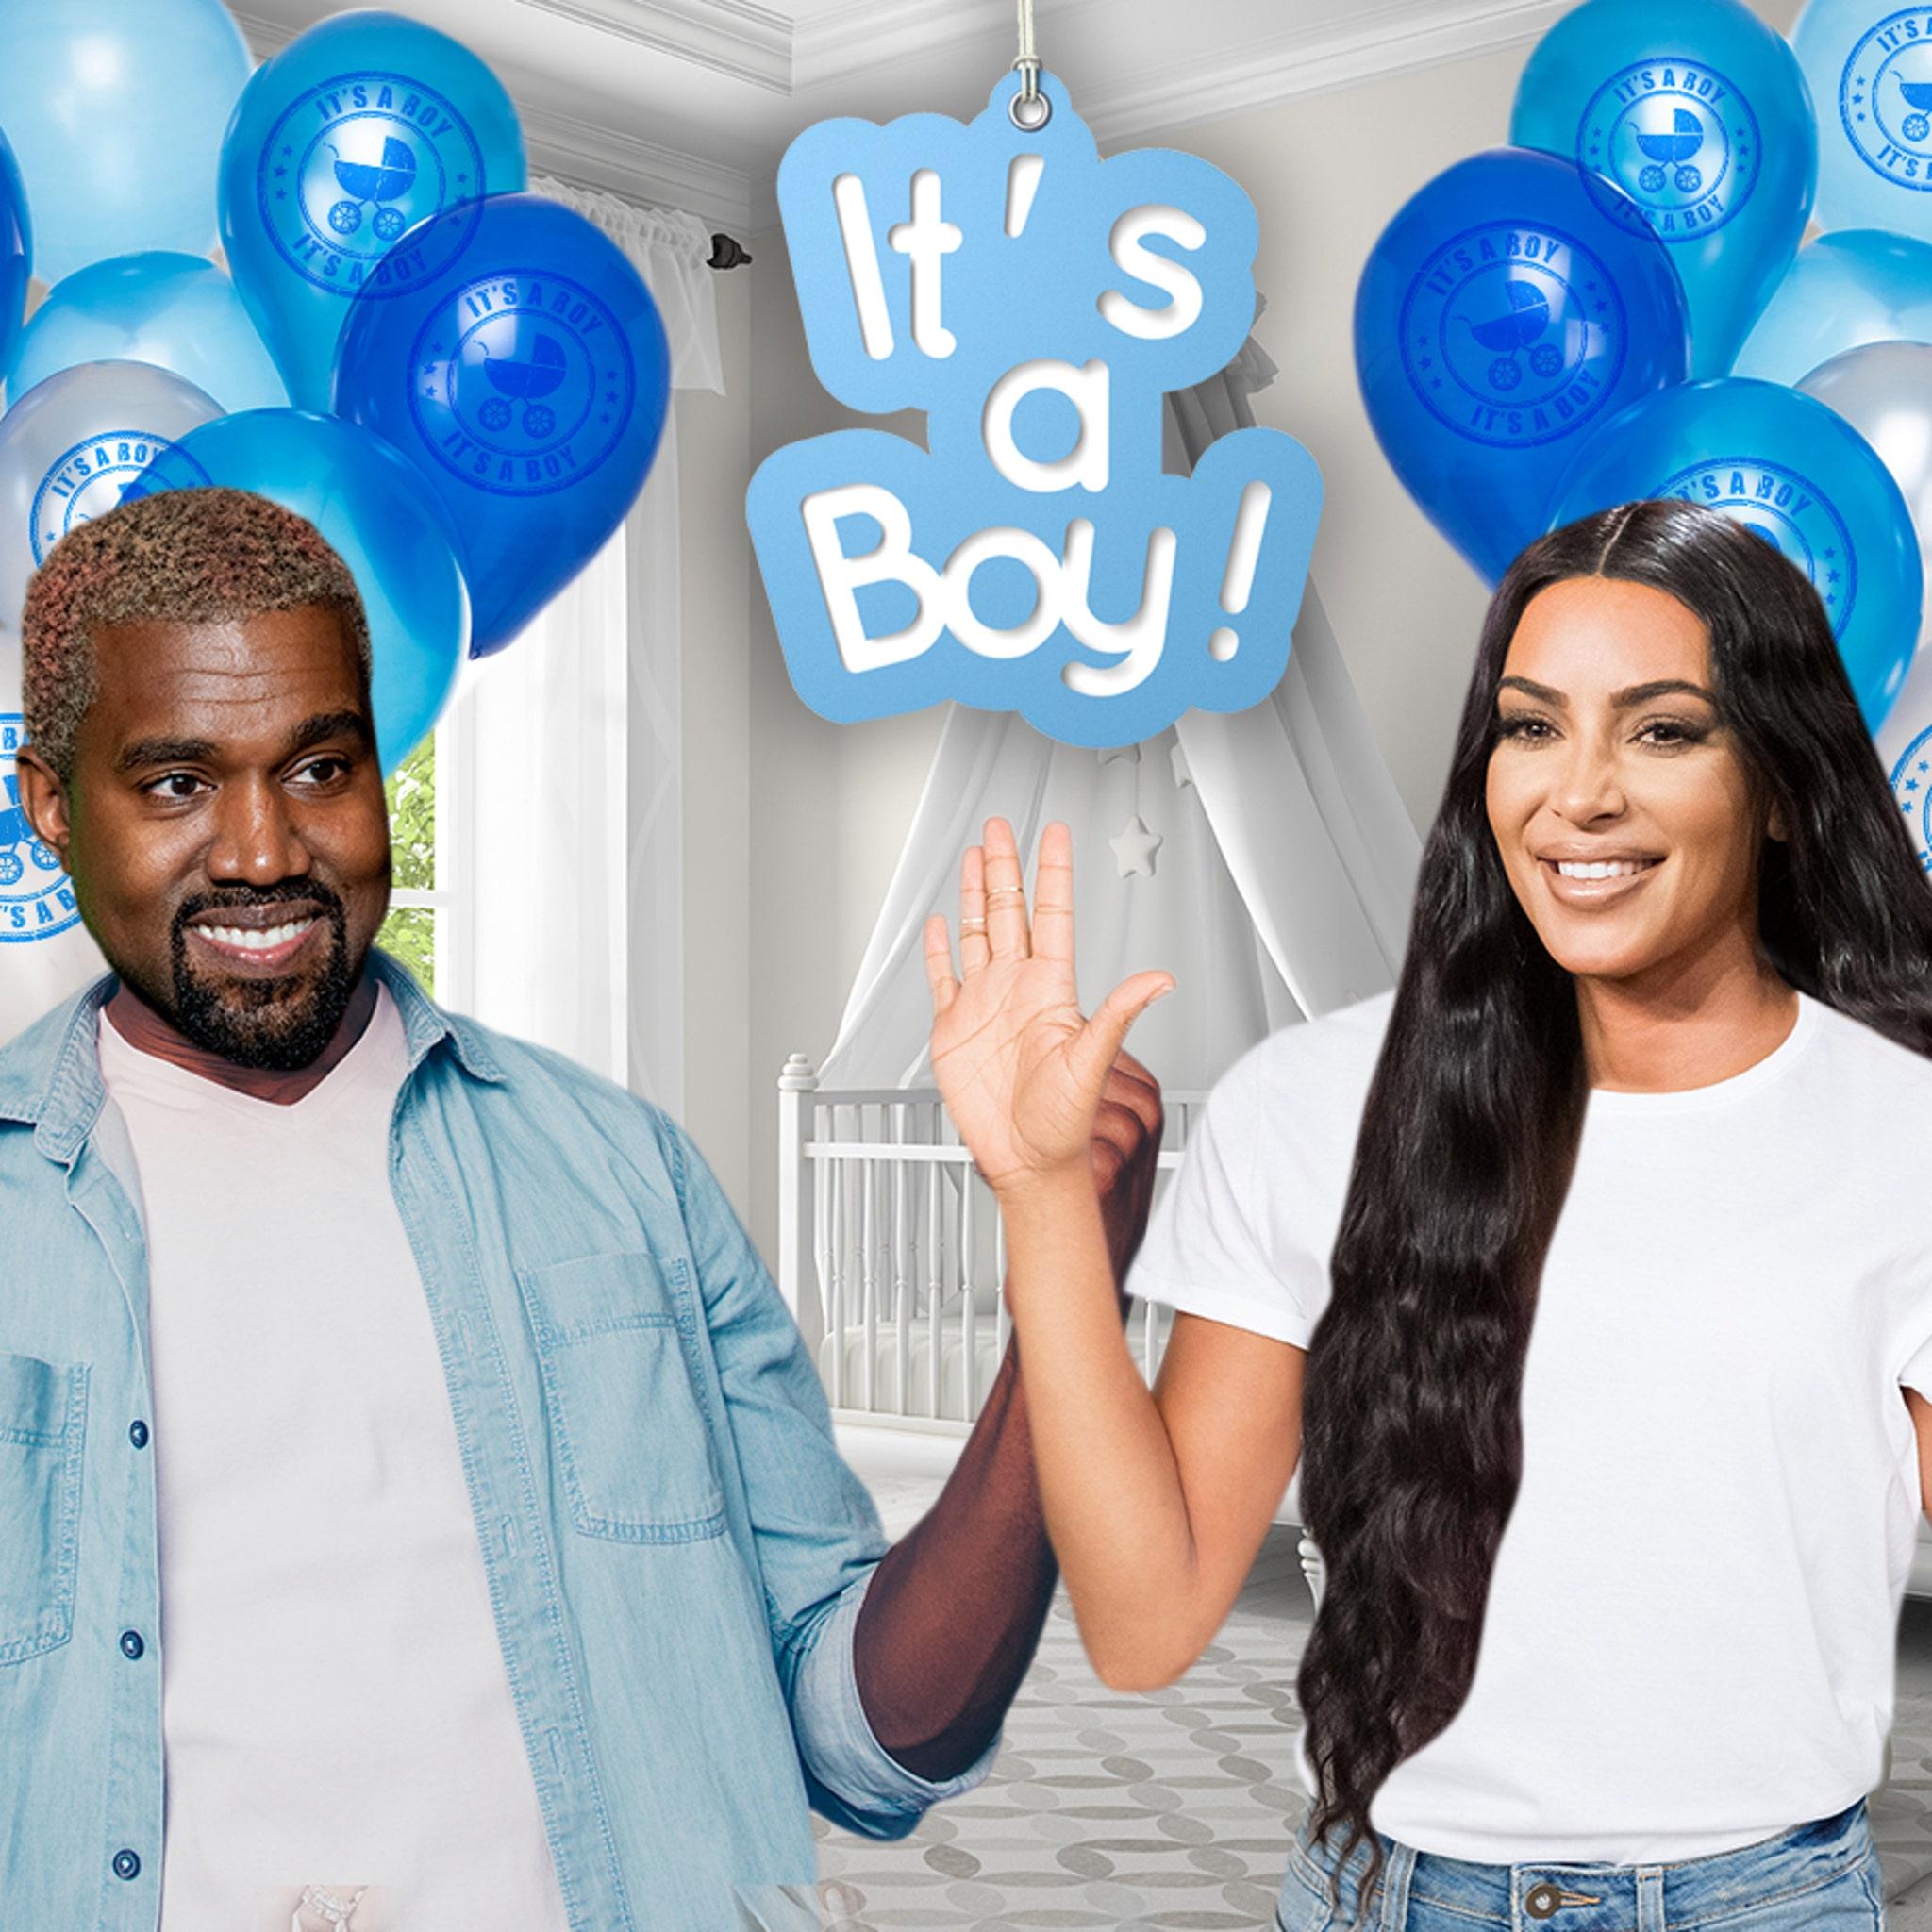 Kim Kardashian and Kanye West's Surrogate Gives Birth to Fourth Child